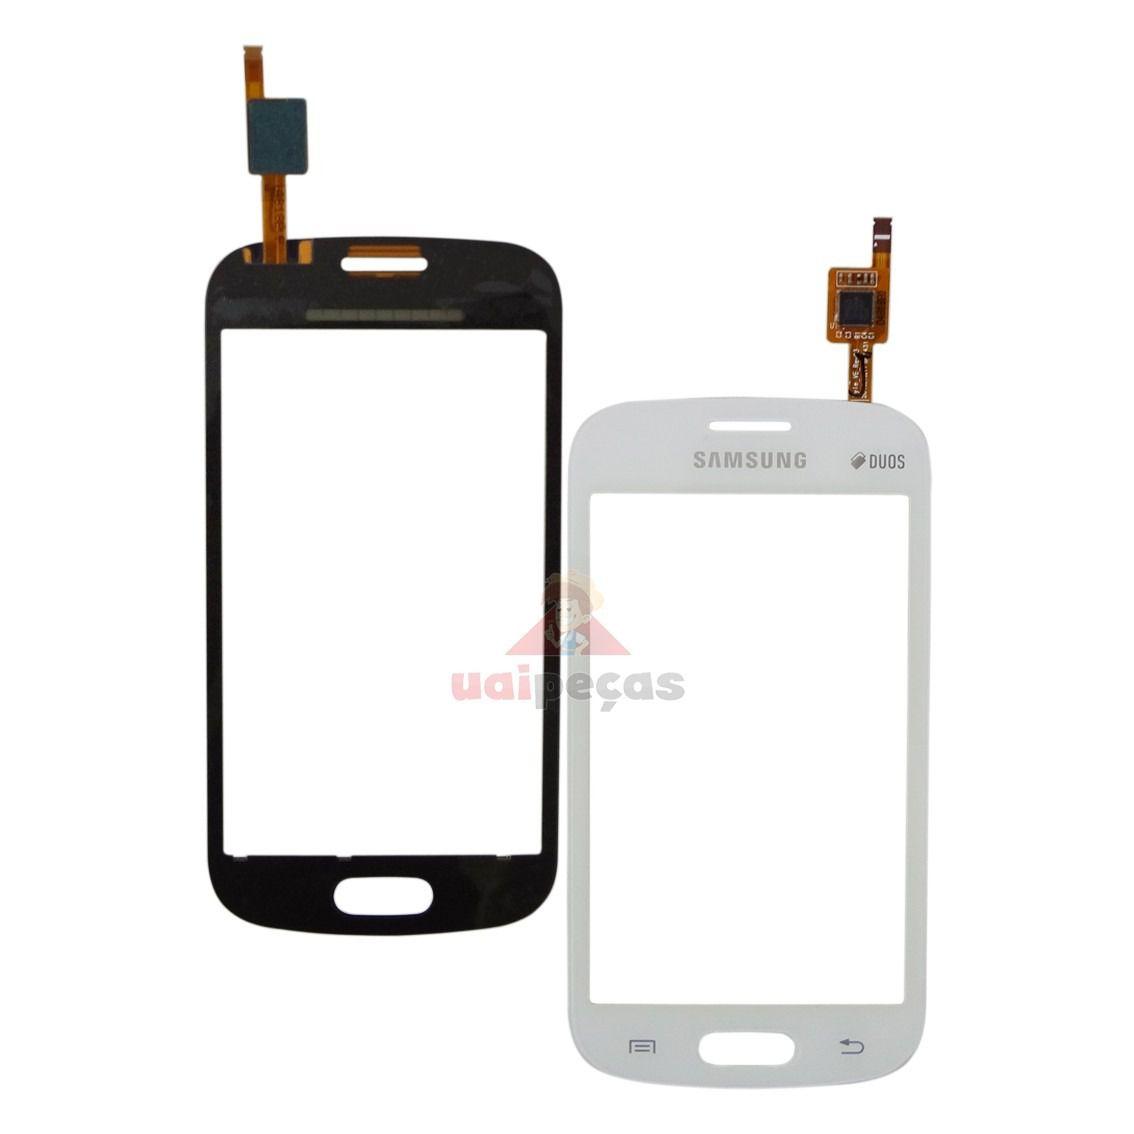 Tela Touch screen Frente  Samsung  Galaxy  S7392Fresh Duos S7390 BRANCO